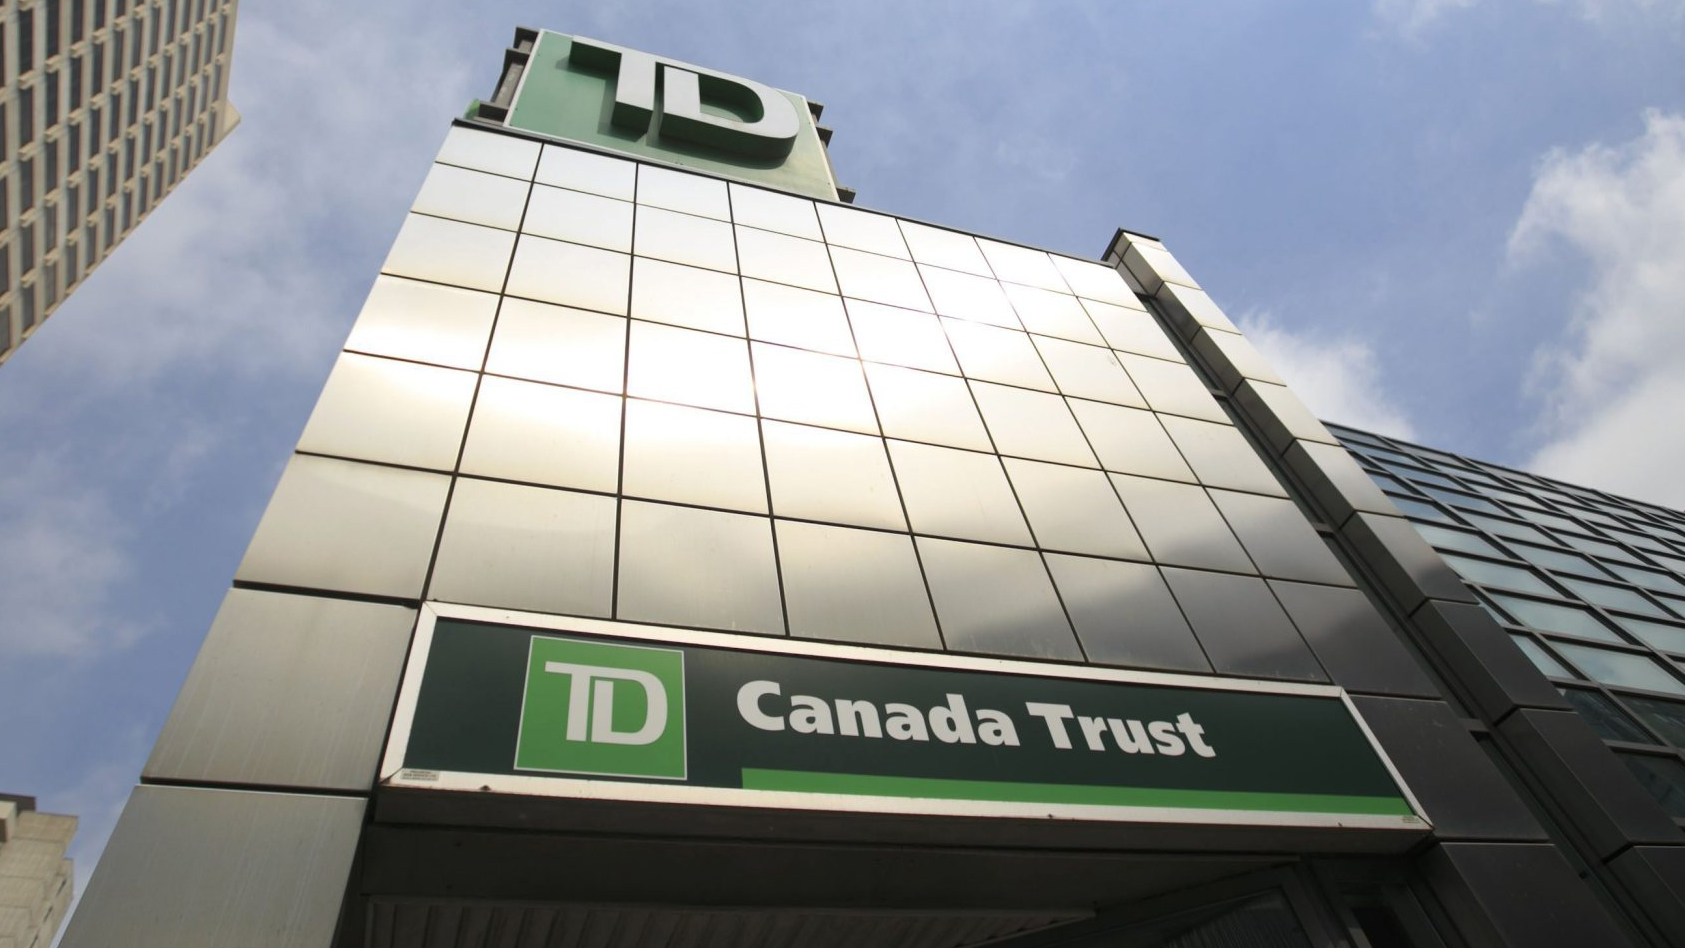 td canada trust address